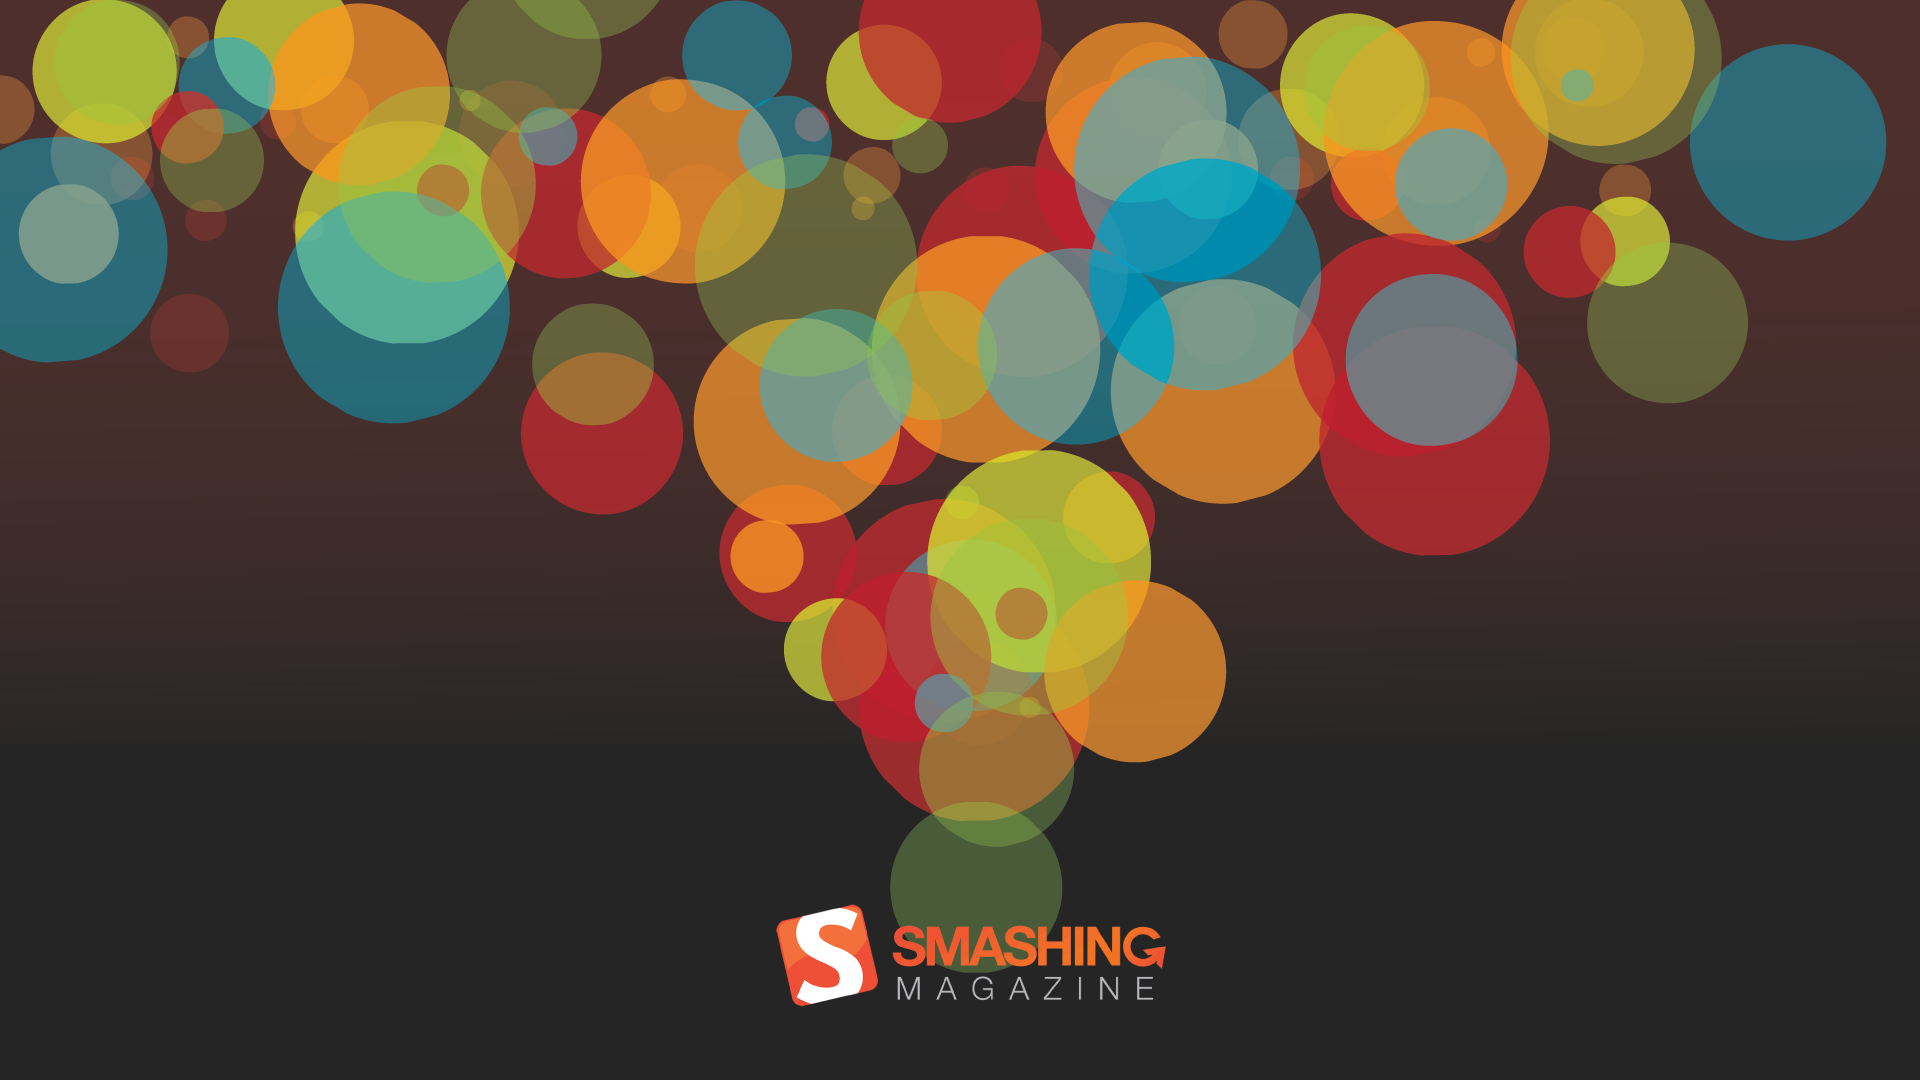 Desktop Wallpaper Calendars: January 2014 – Smashing Magazine